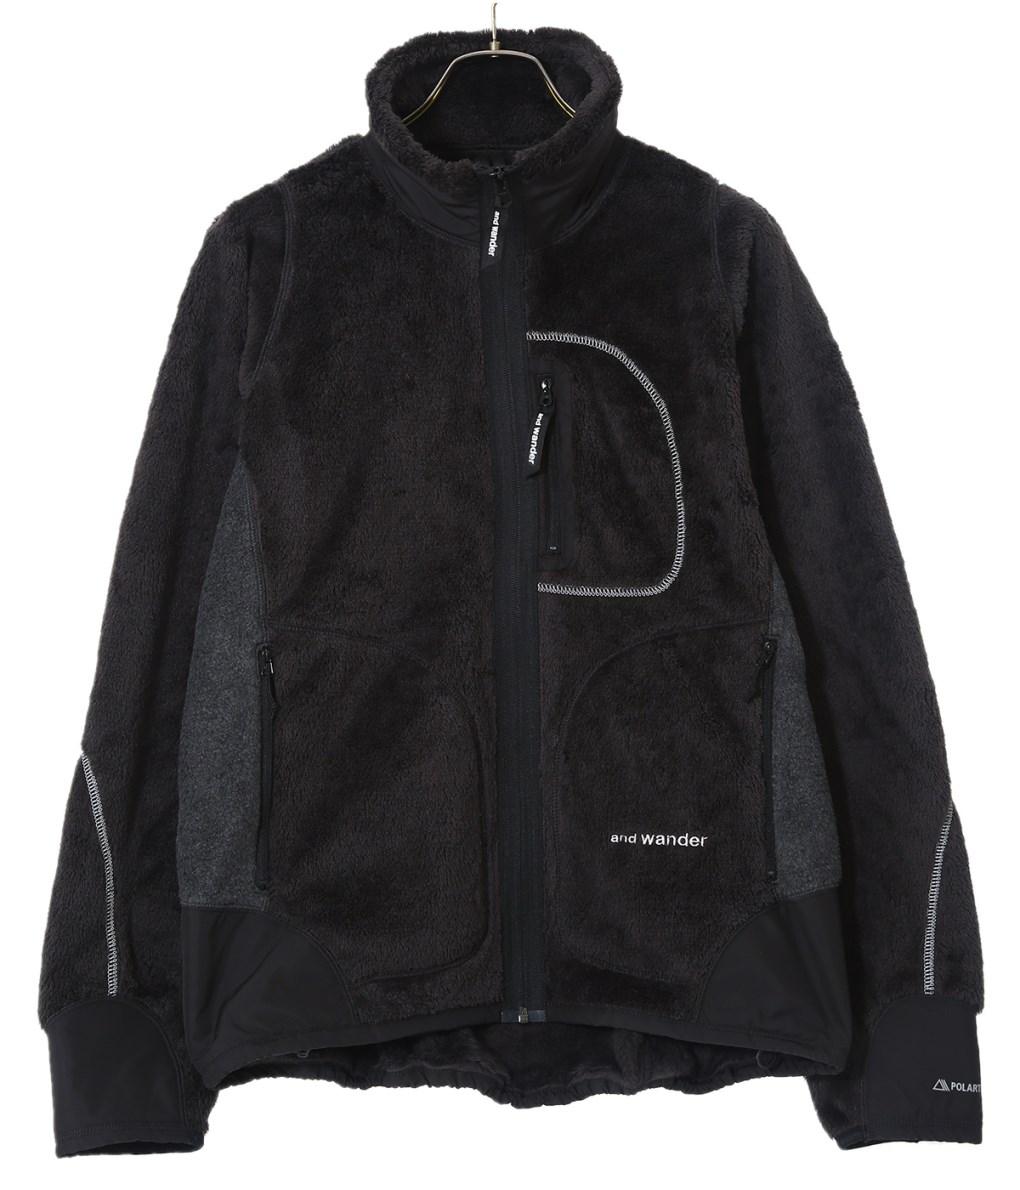 and wander / アンドワンダー : high loft fleece jacket : ハイ ロフト フリース ジャケット : AW93-JT601 【PIE】